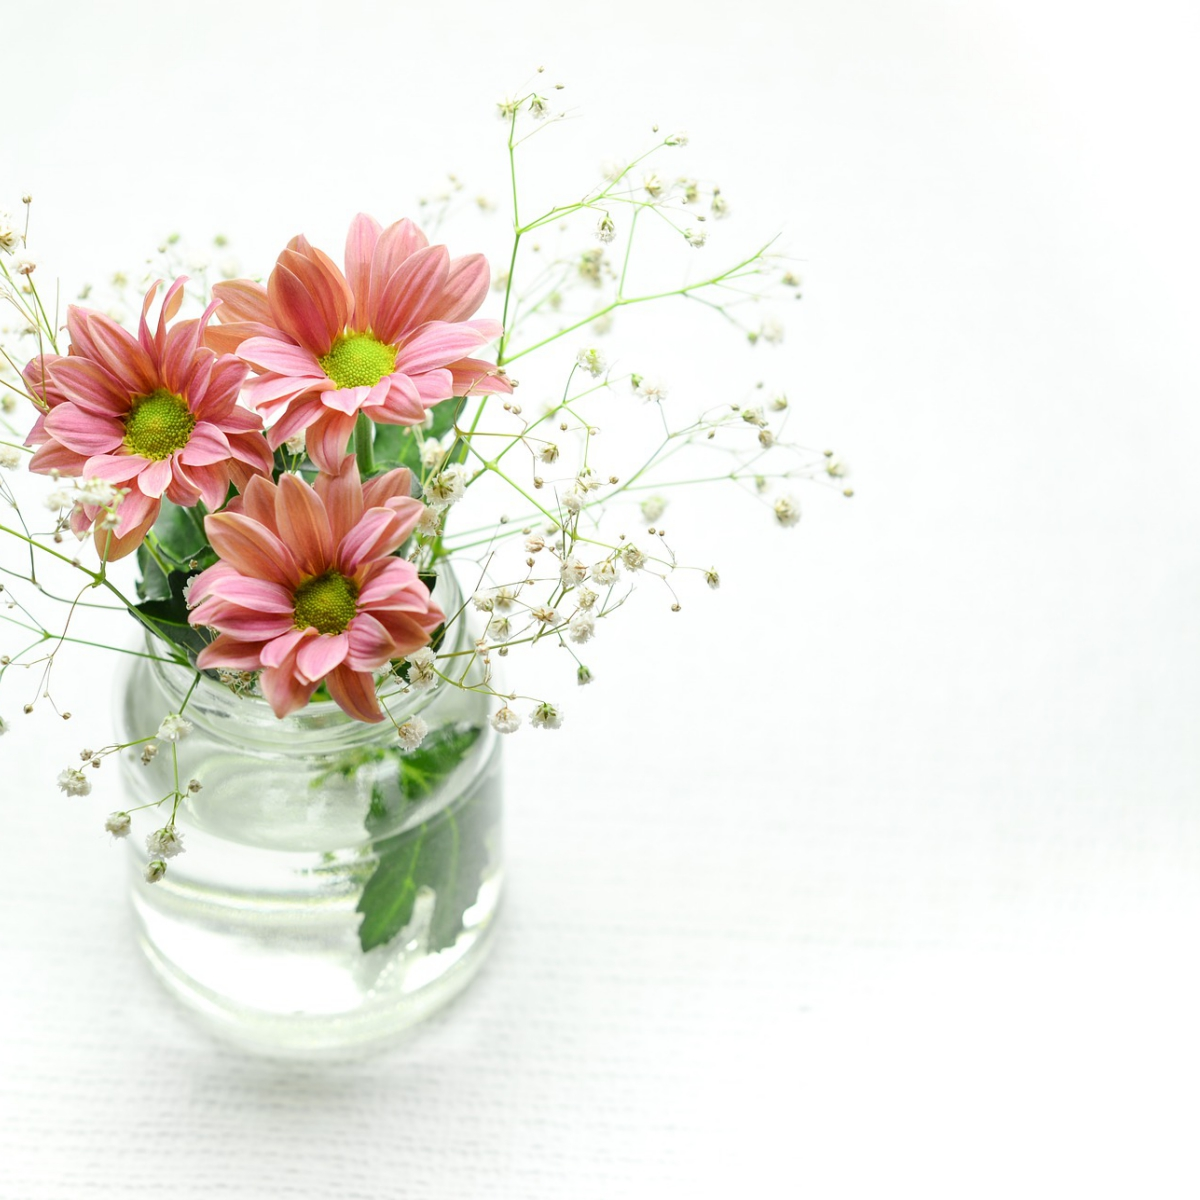 pink-2609210_1920.jpg